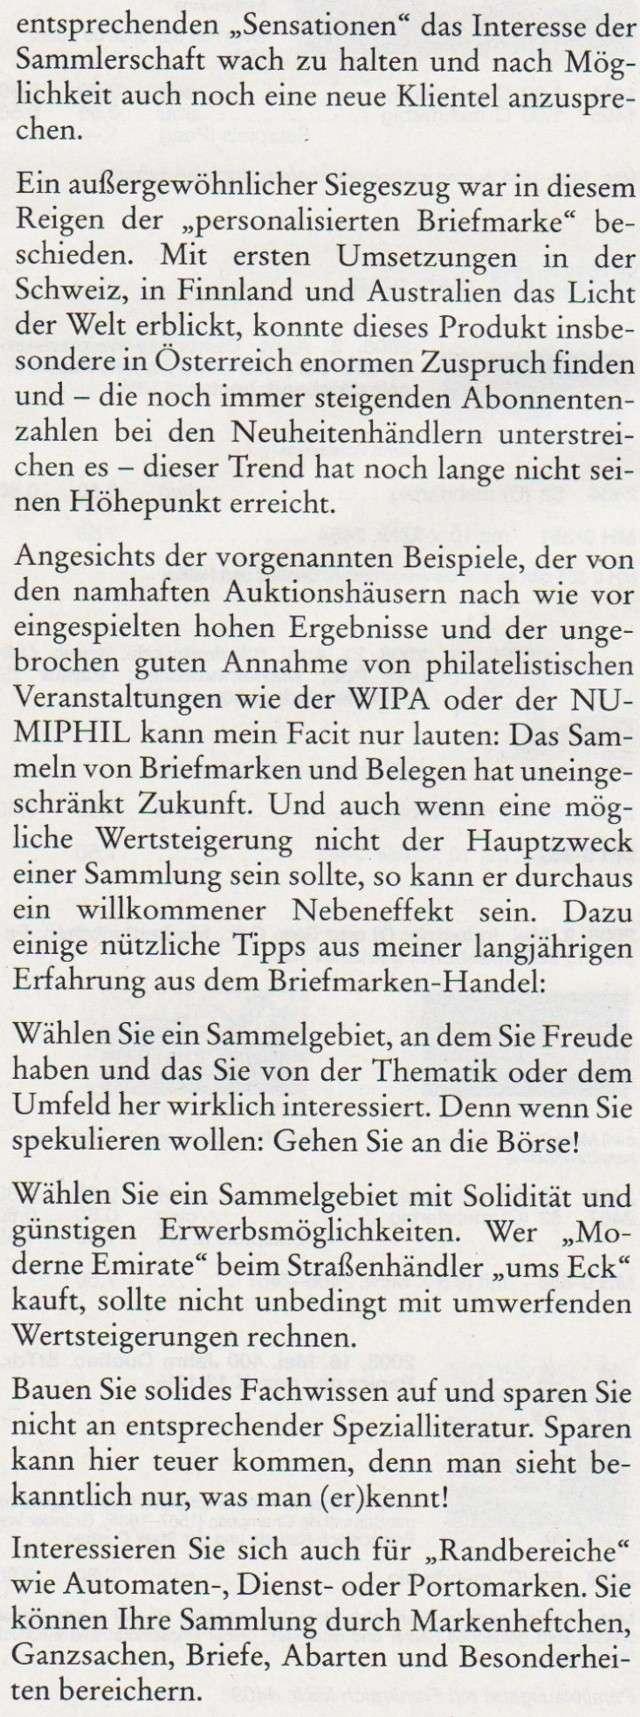 Michel-Rundschau 11/2008 W310